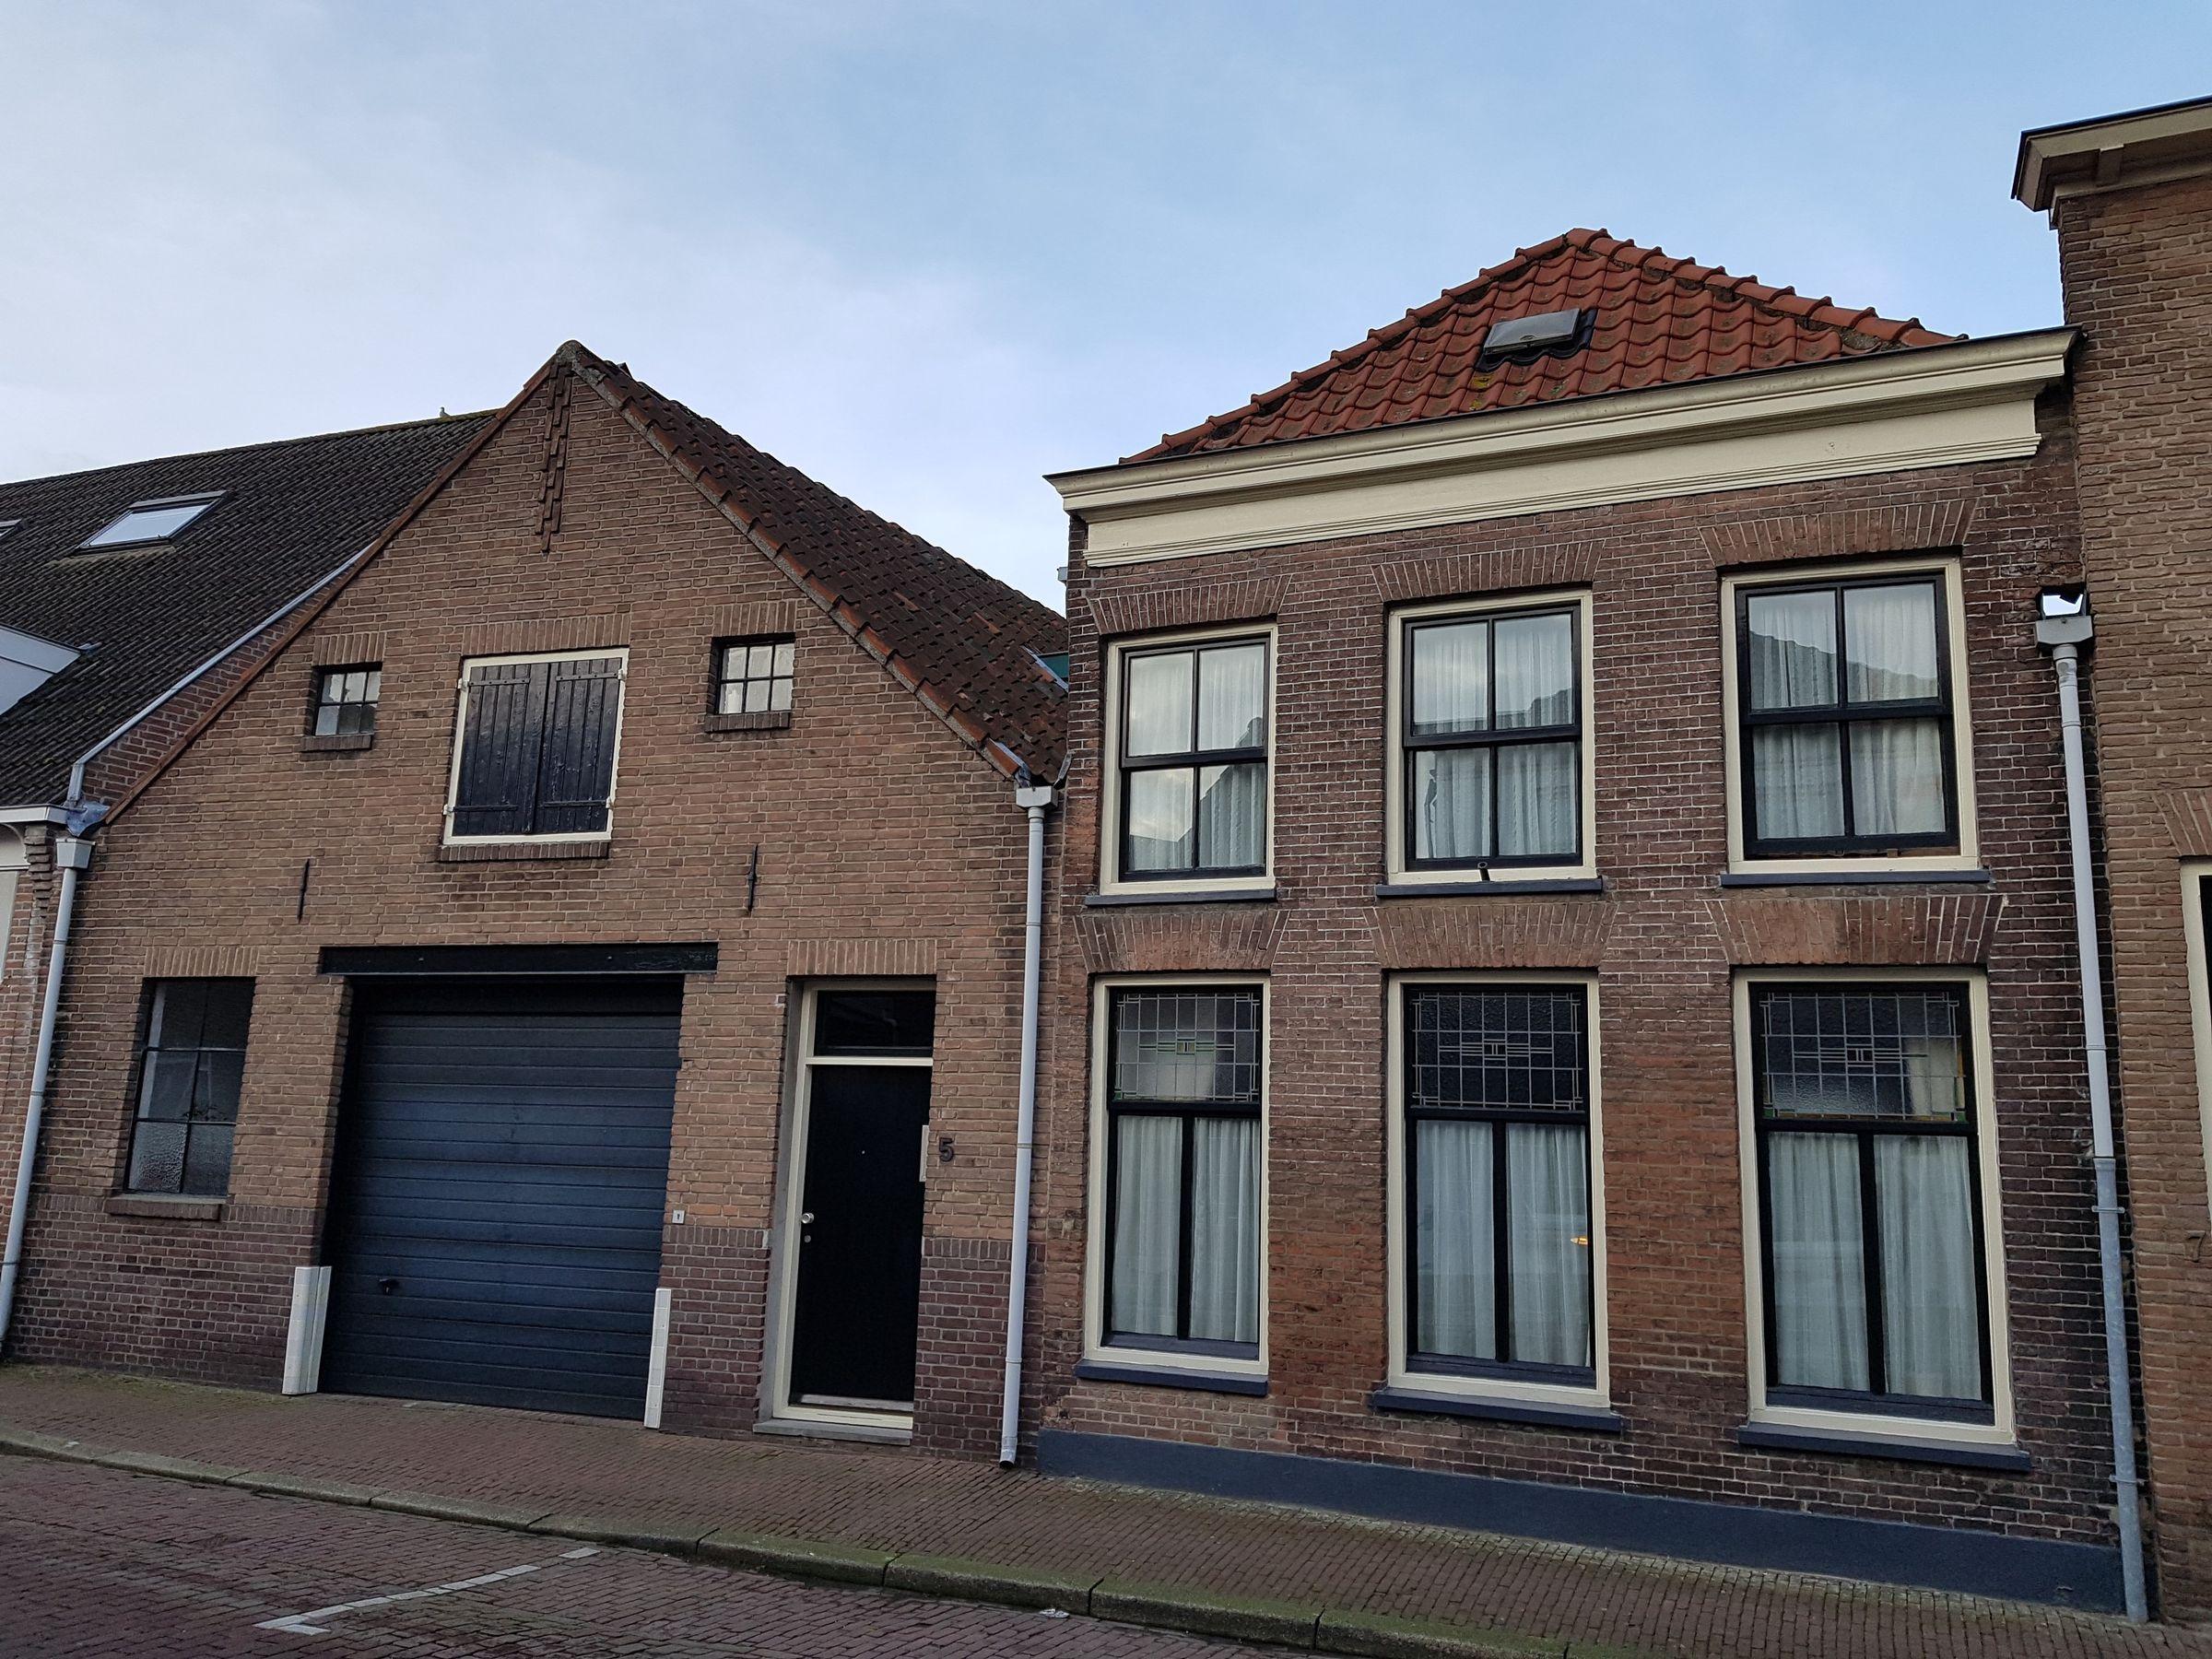 Oenselsestraat 5, Zaltbommel